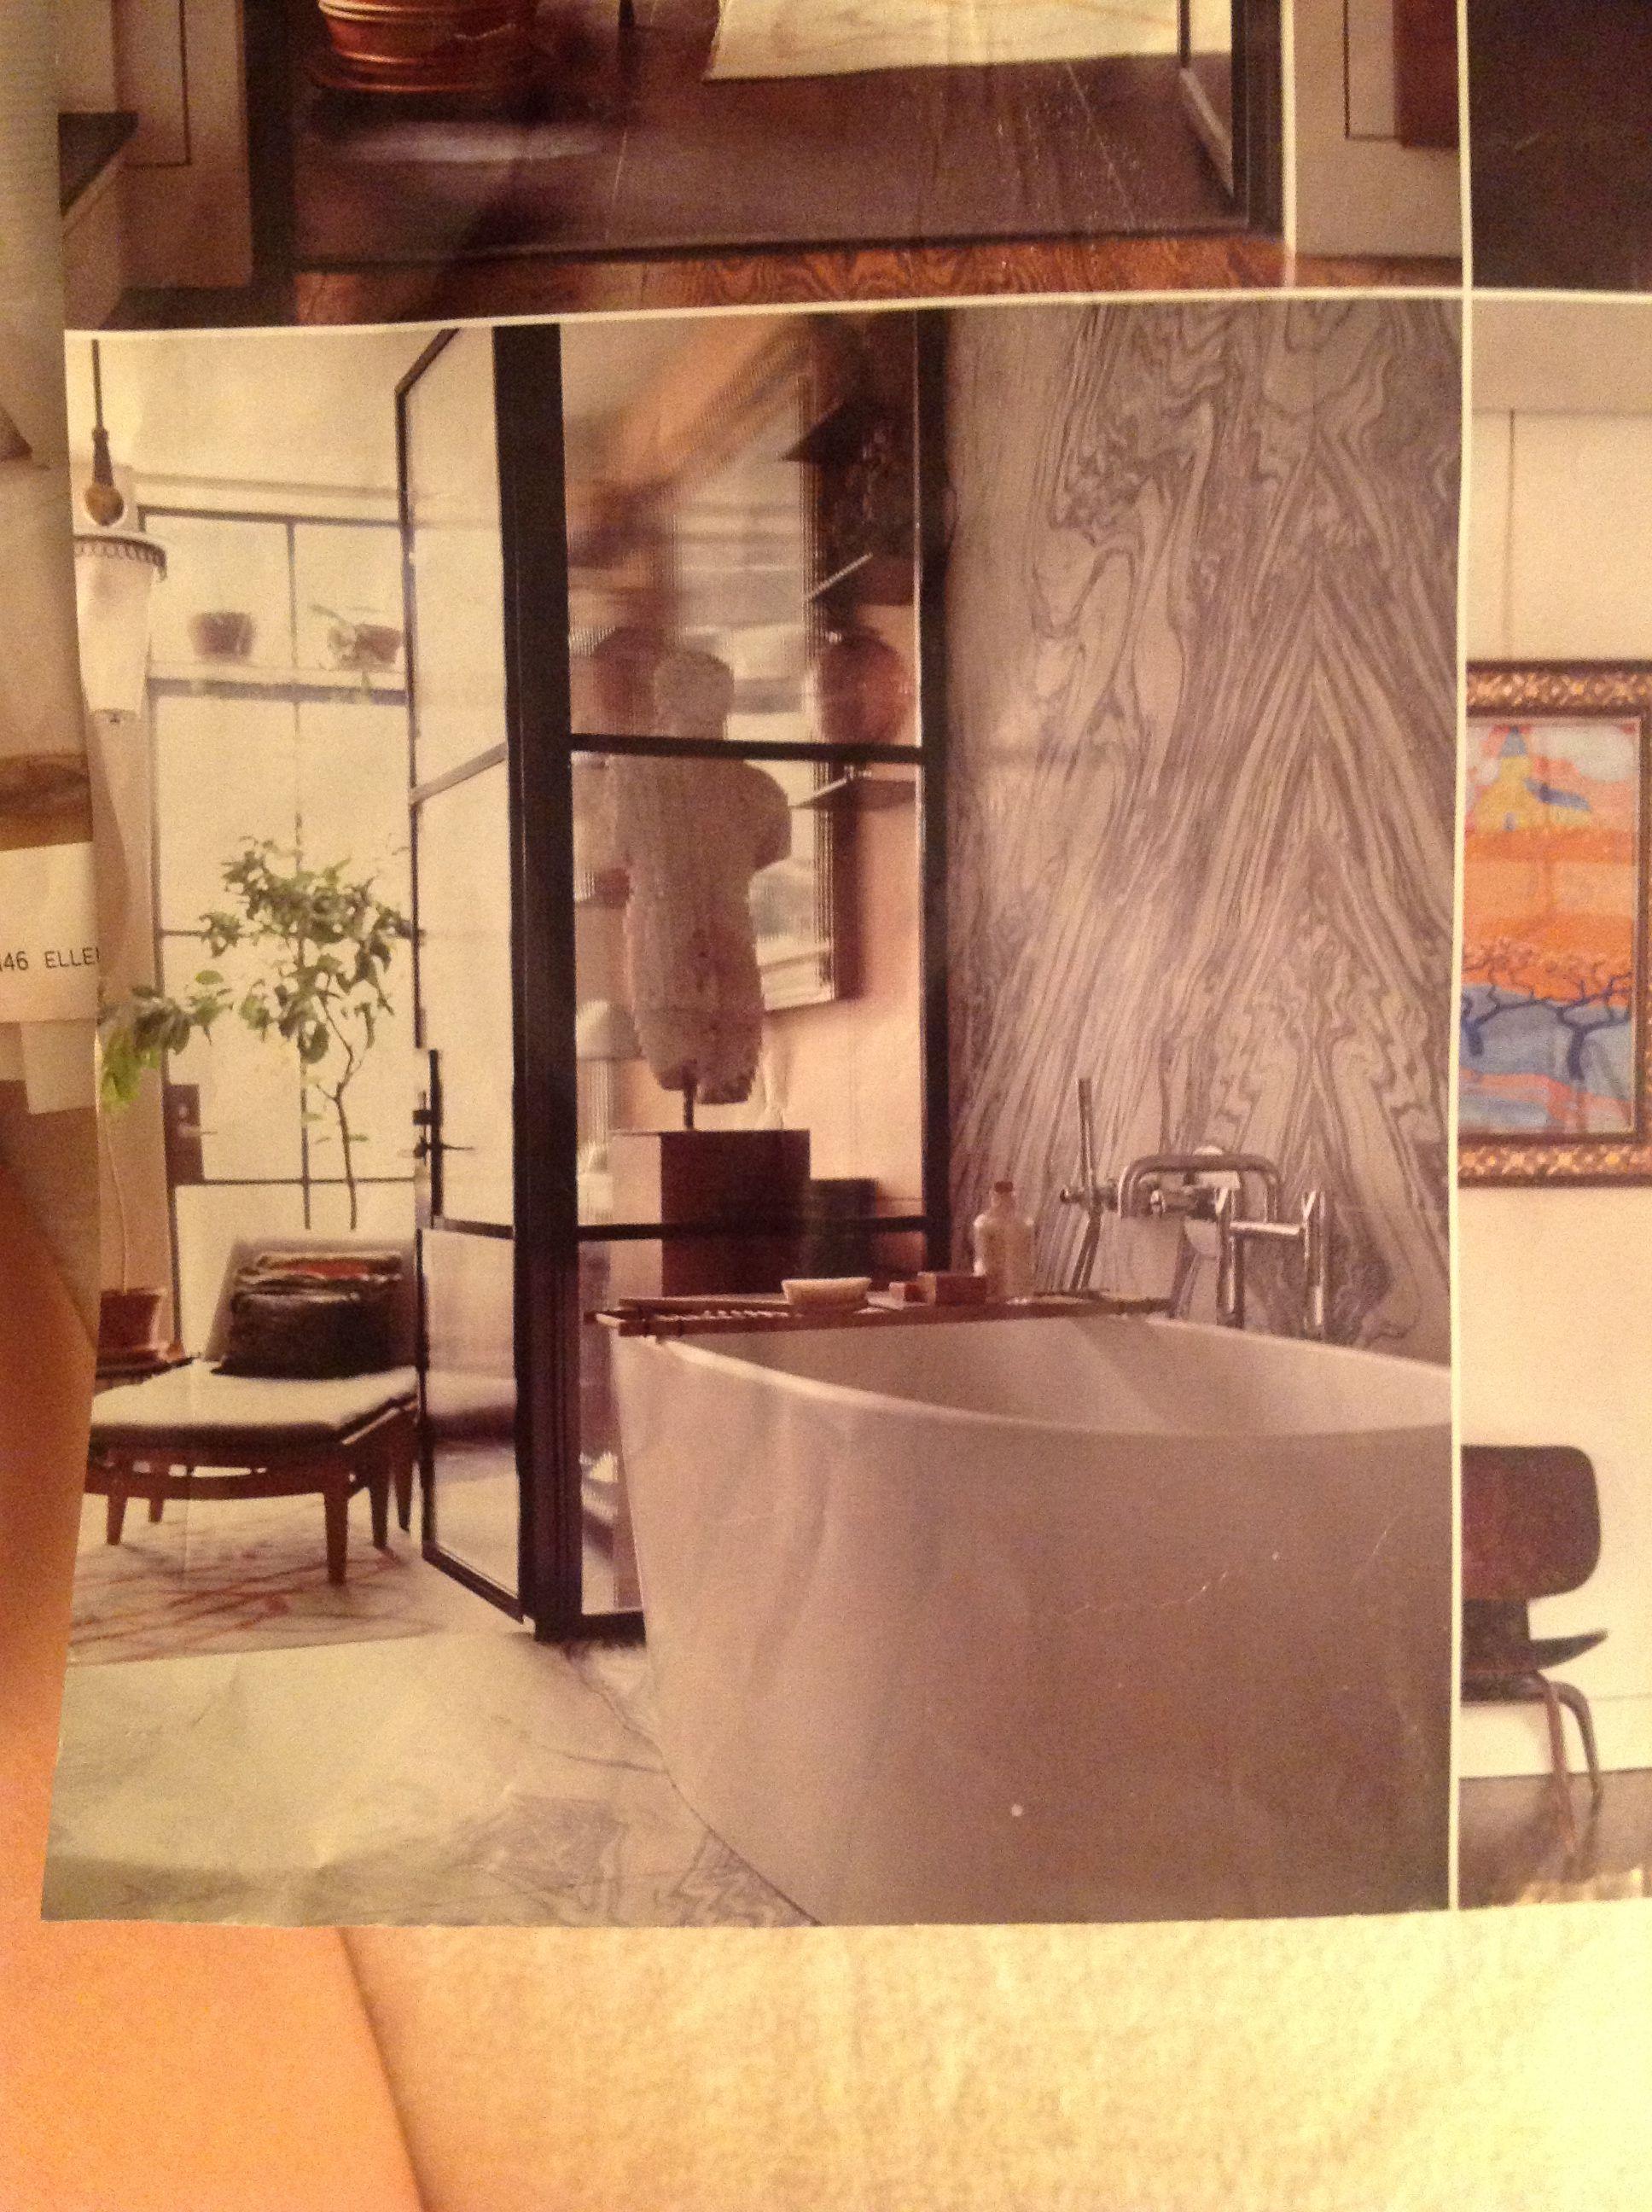 Bathroom interior wall marble up wall behind tub  bathrooms  pinterest  tubs marbles